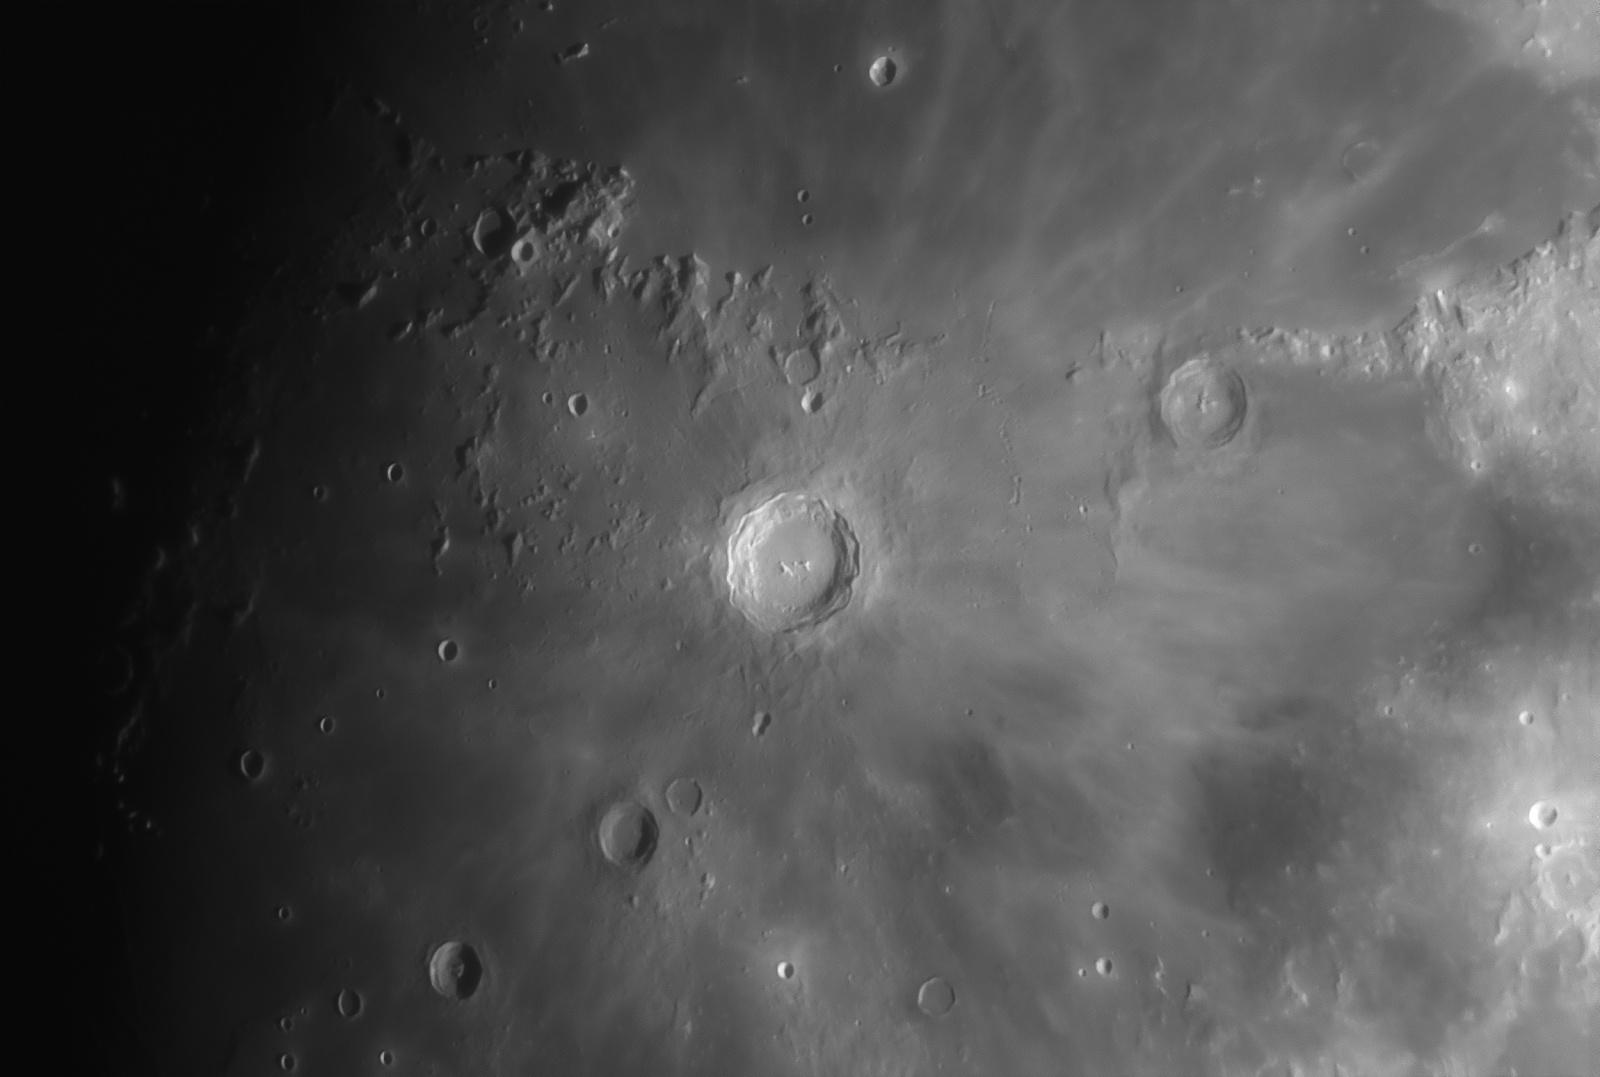 2020_11_25_1722_8_Moon_PS3.thumb.jpg.1f9aca99b628bf26965955476322ed4f.jpg